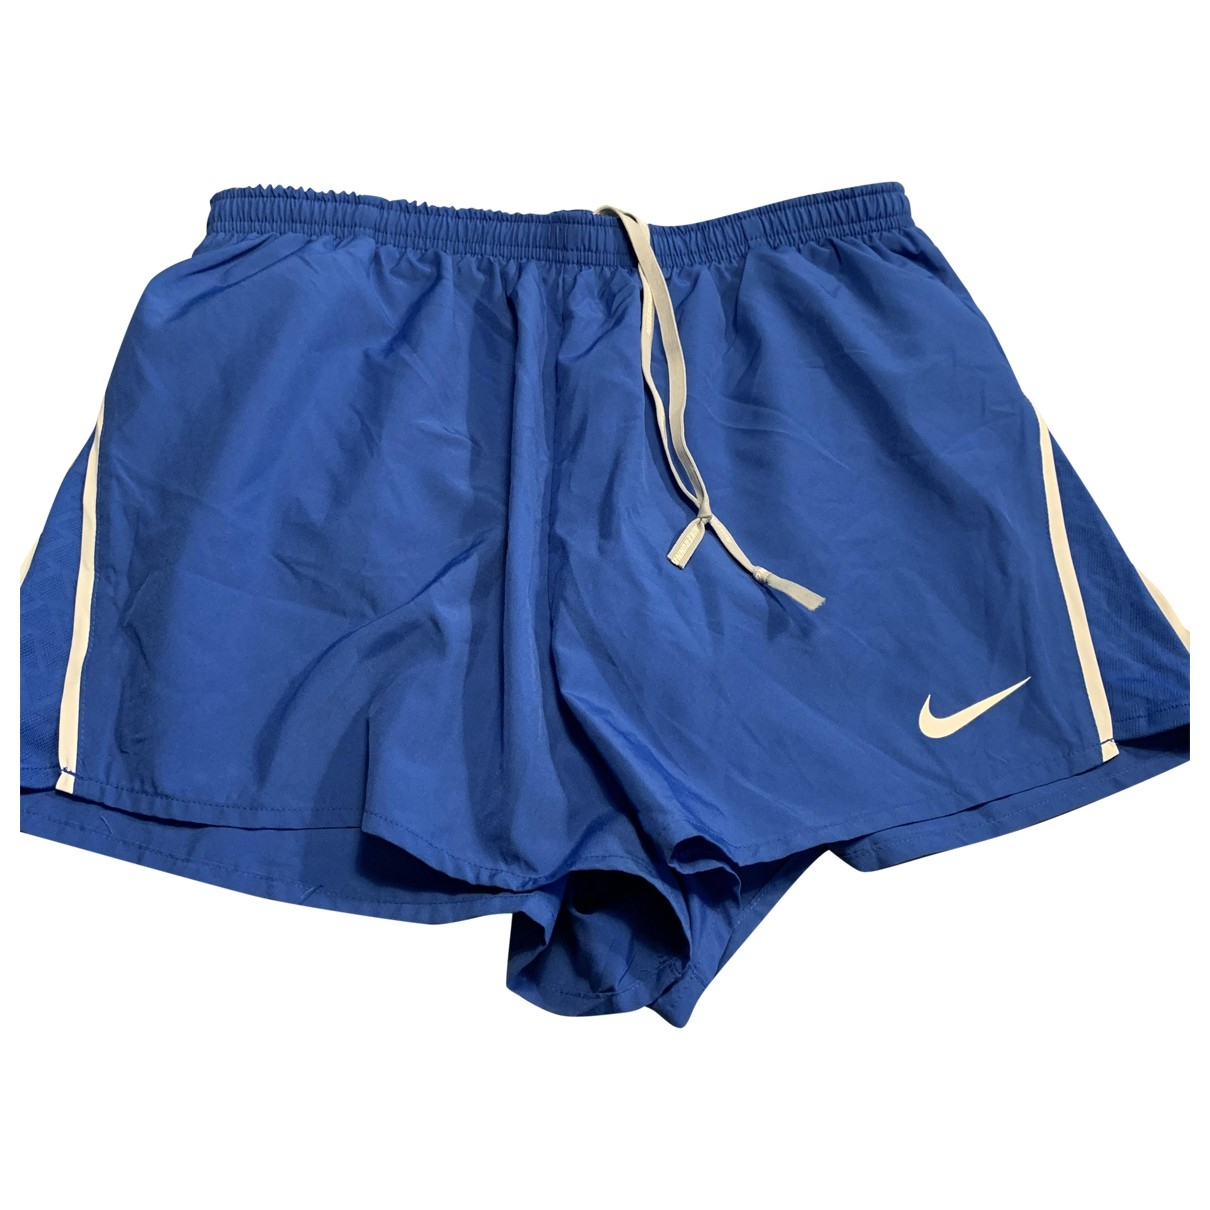 Nike \N Shorts in  Blau Synthetik